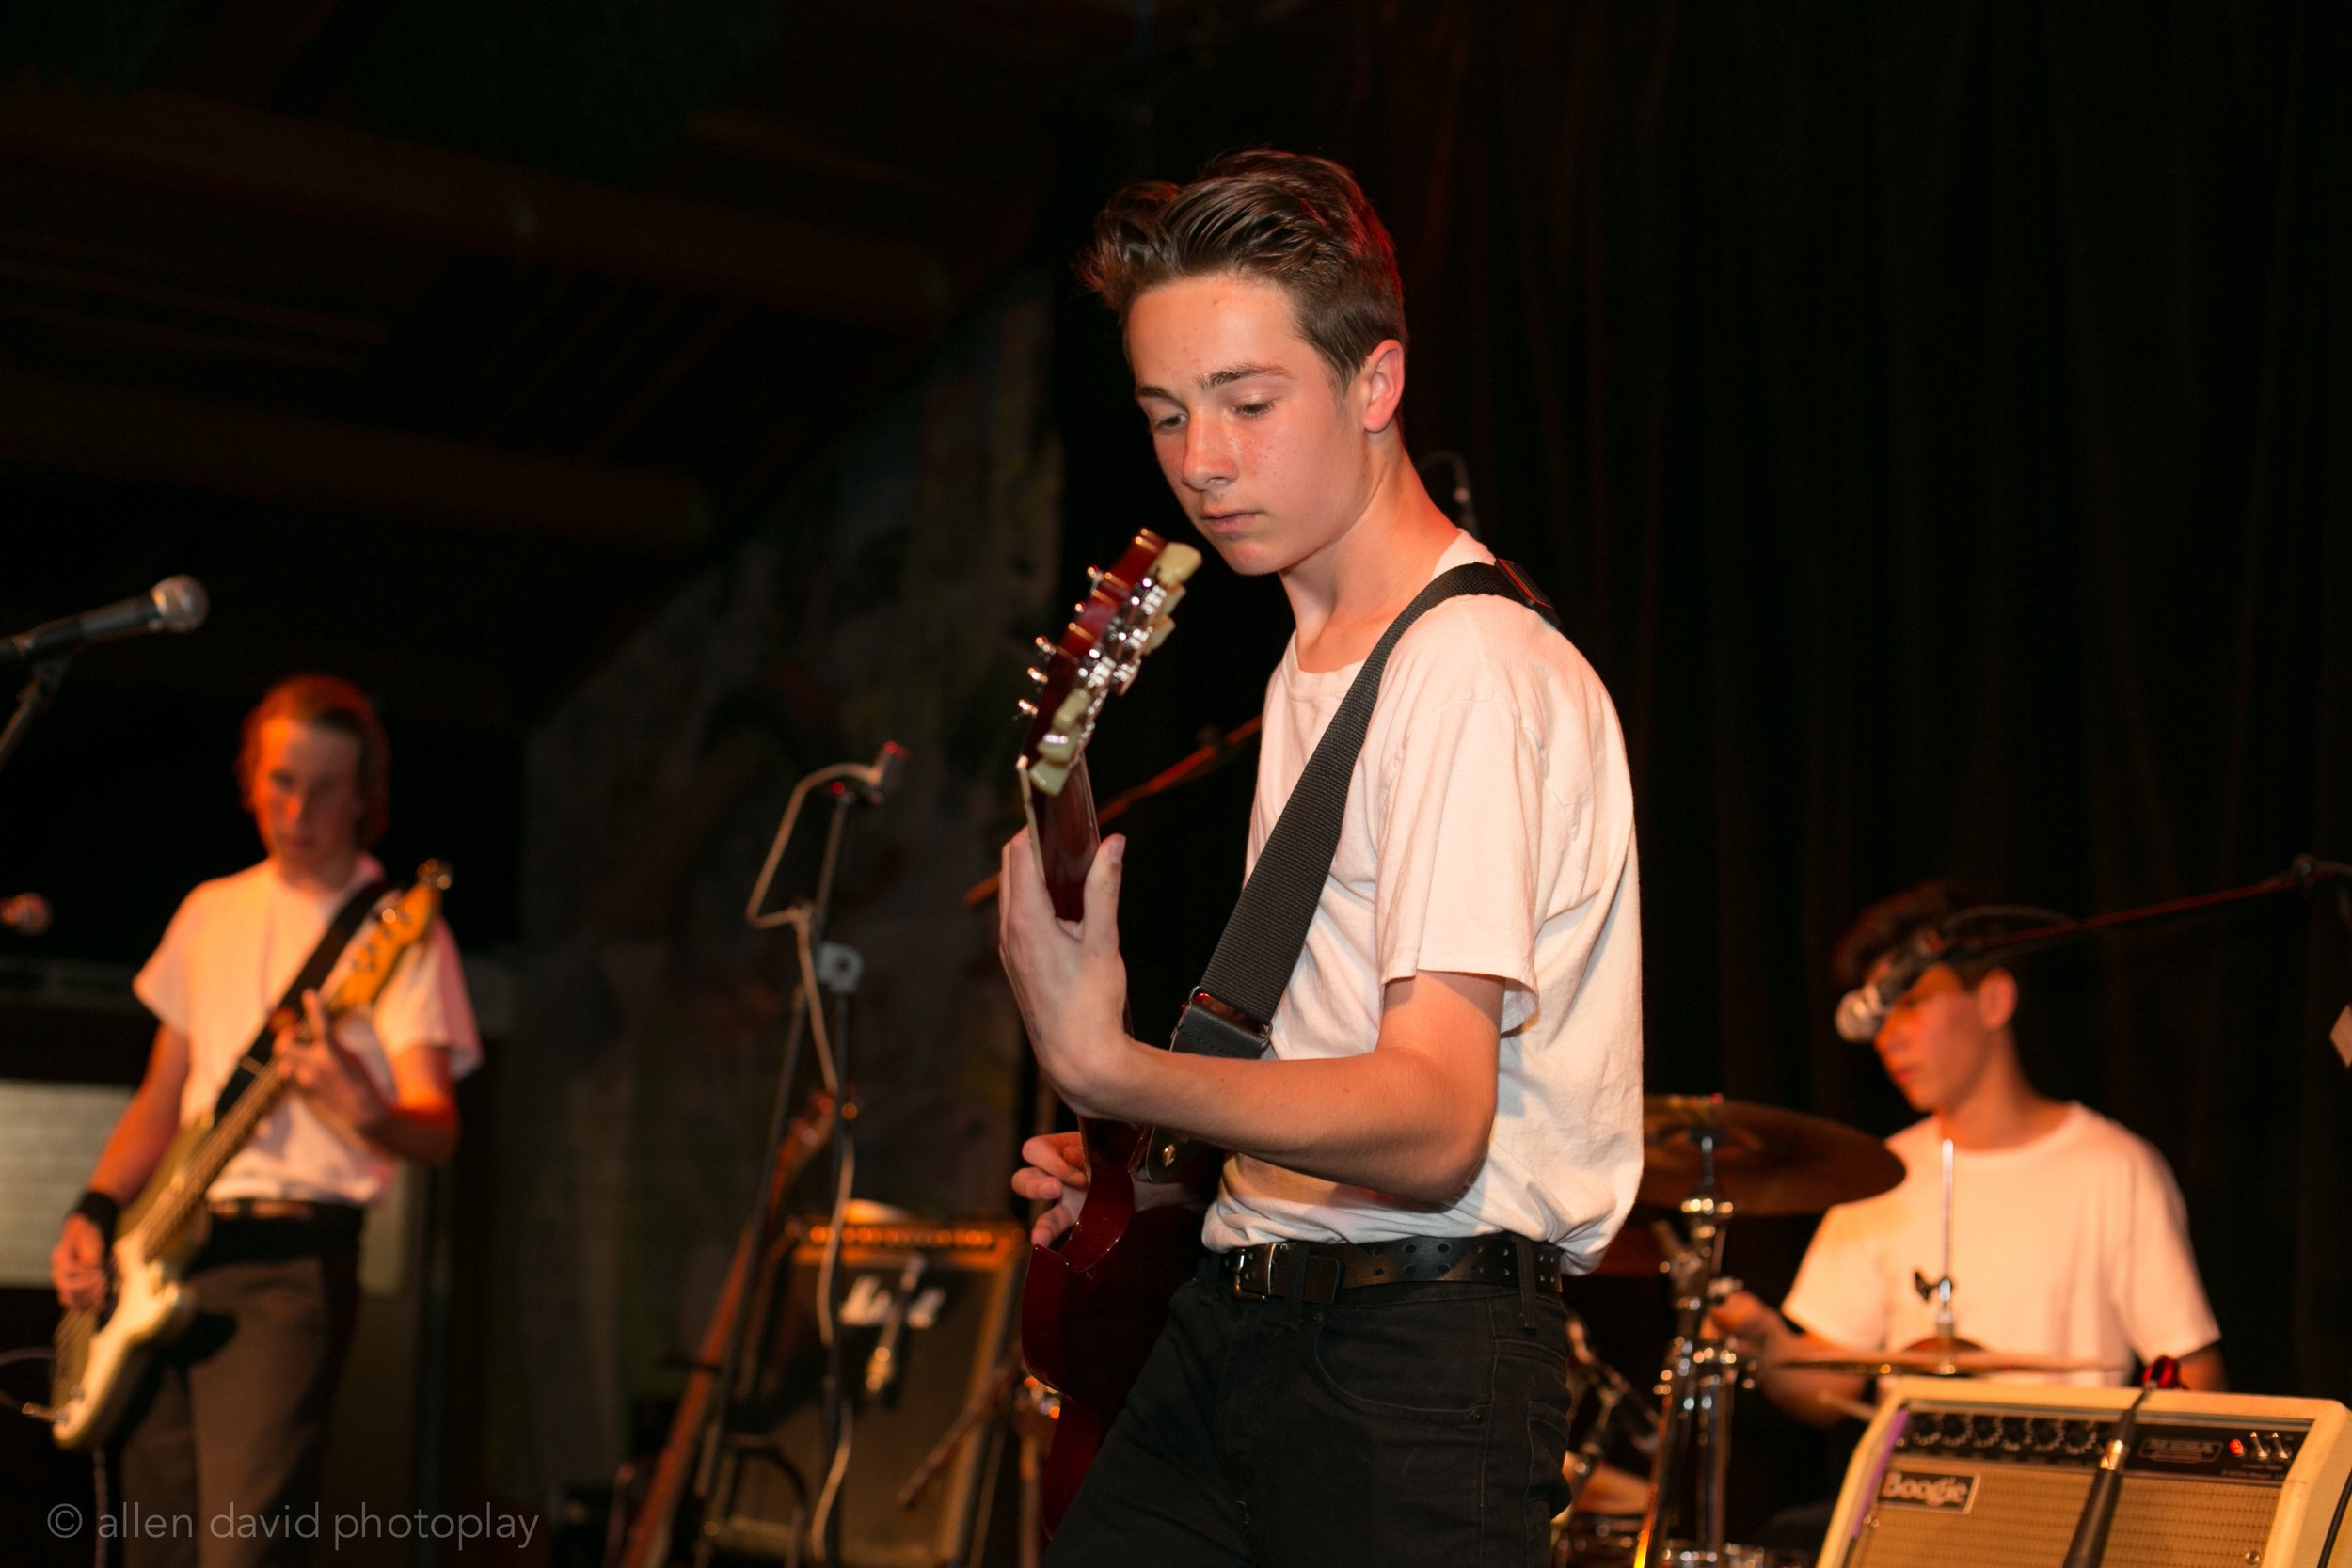 Jackson on Guitar